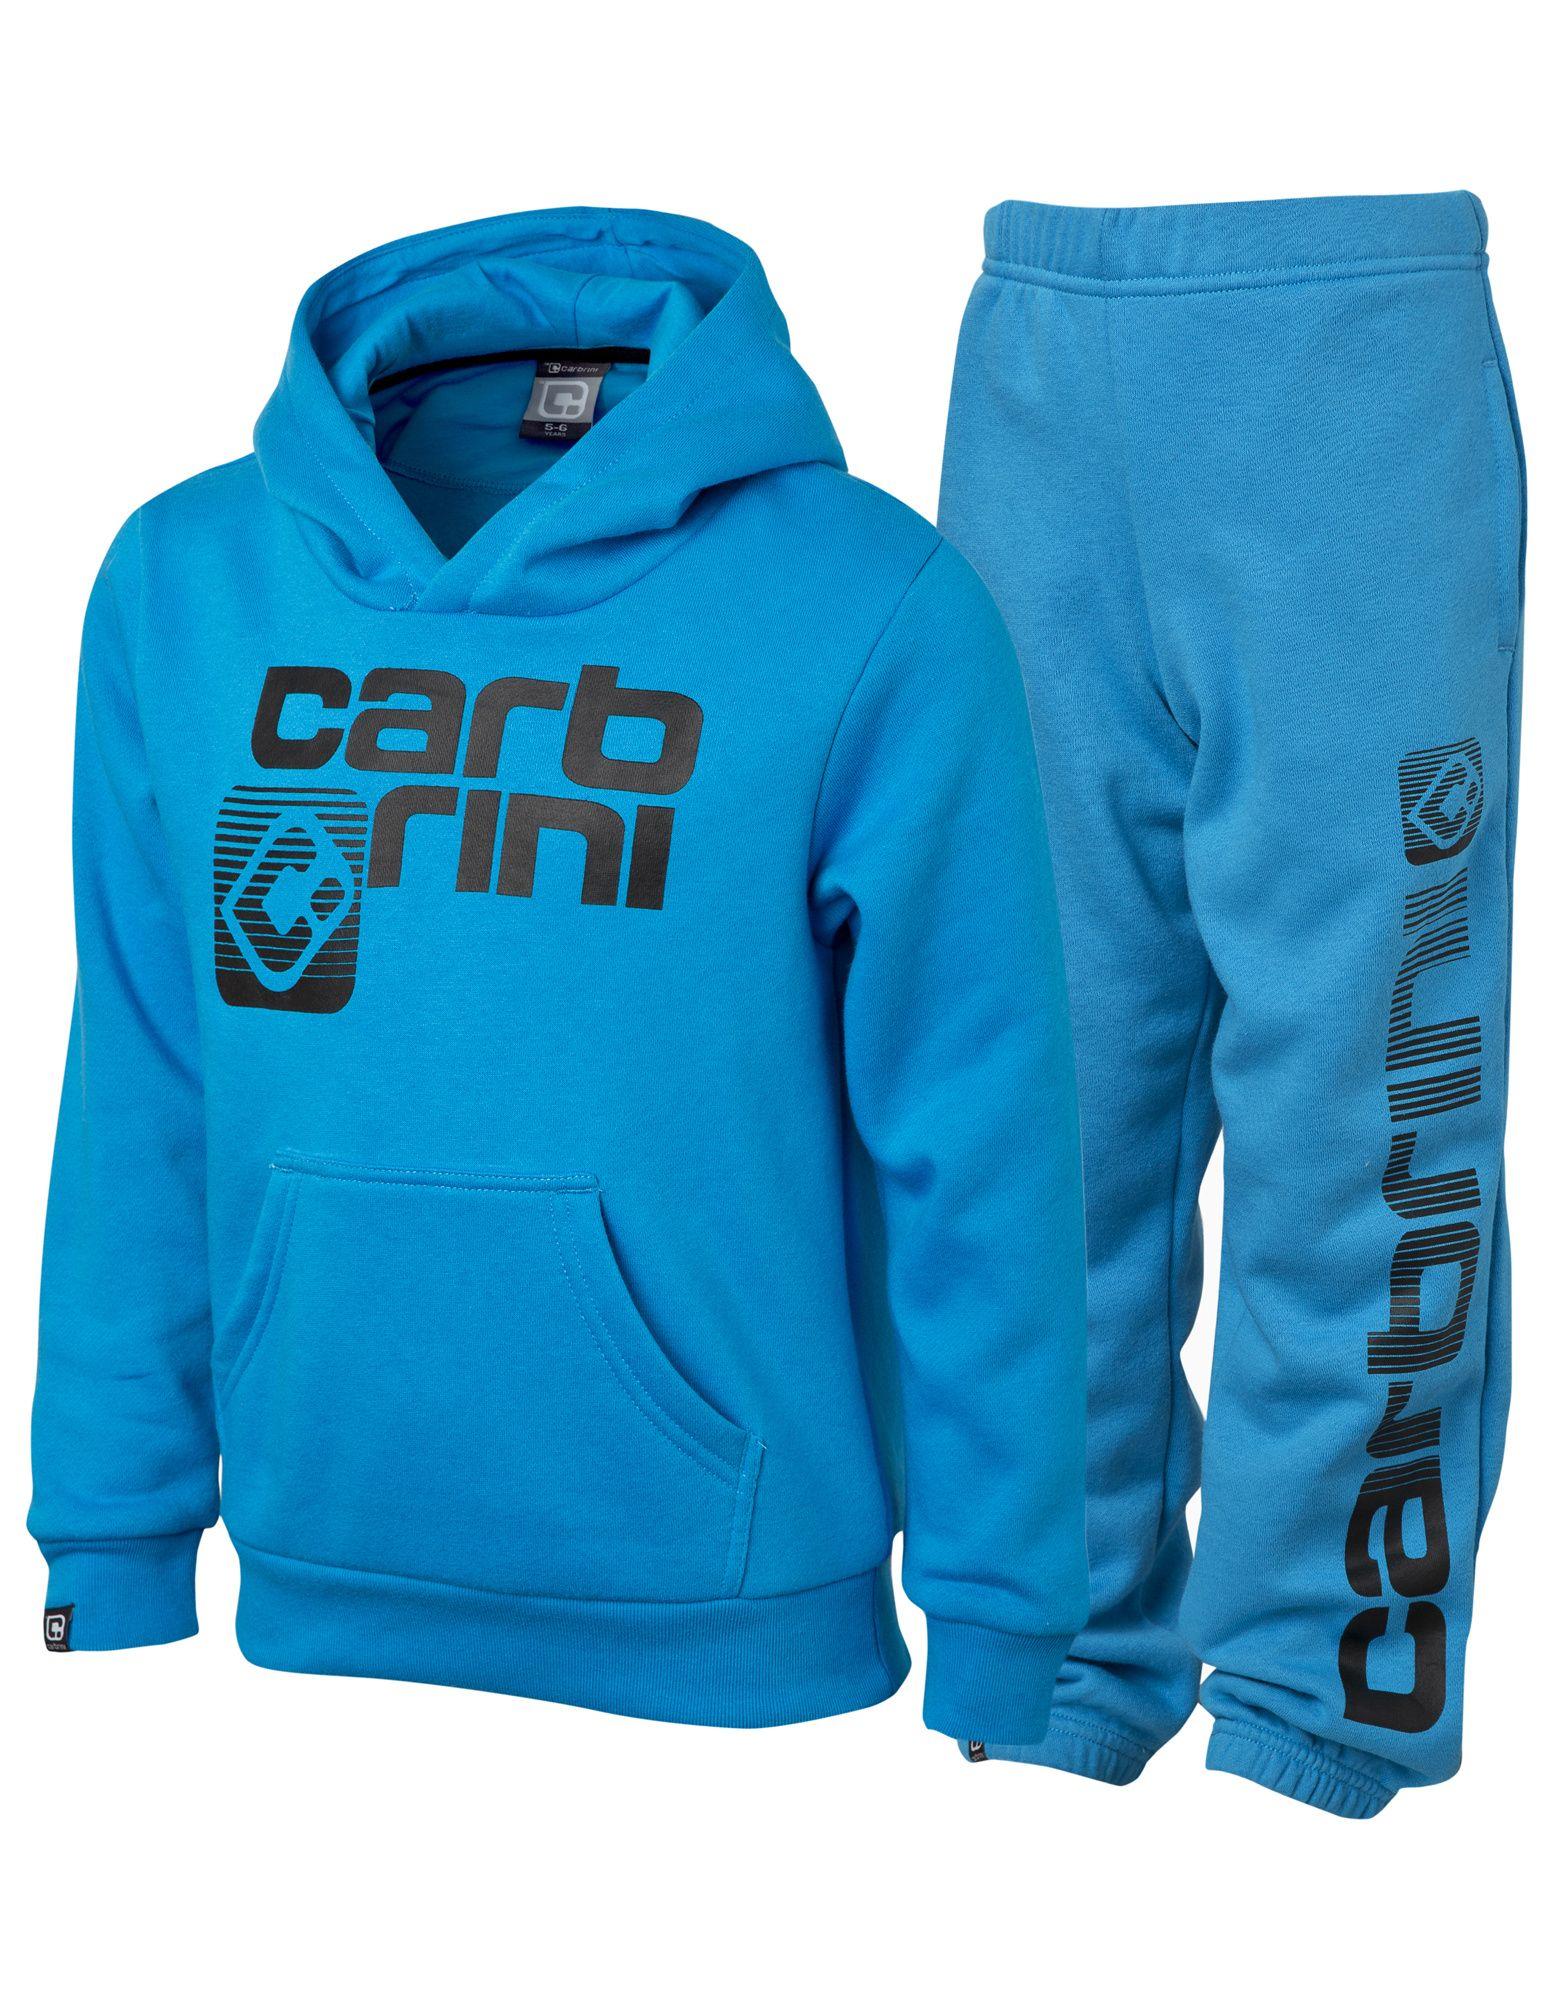 Carbrini Rampage Fleece Suit Childrens